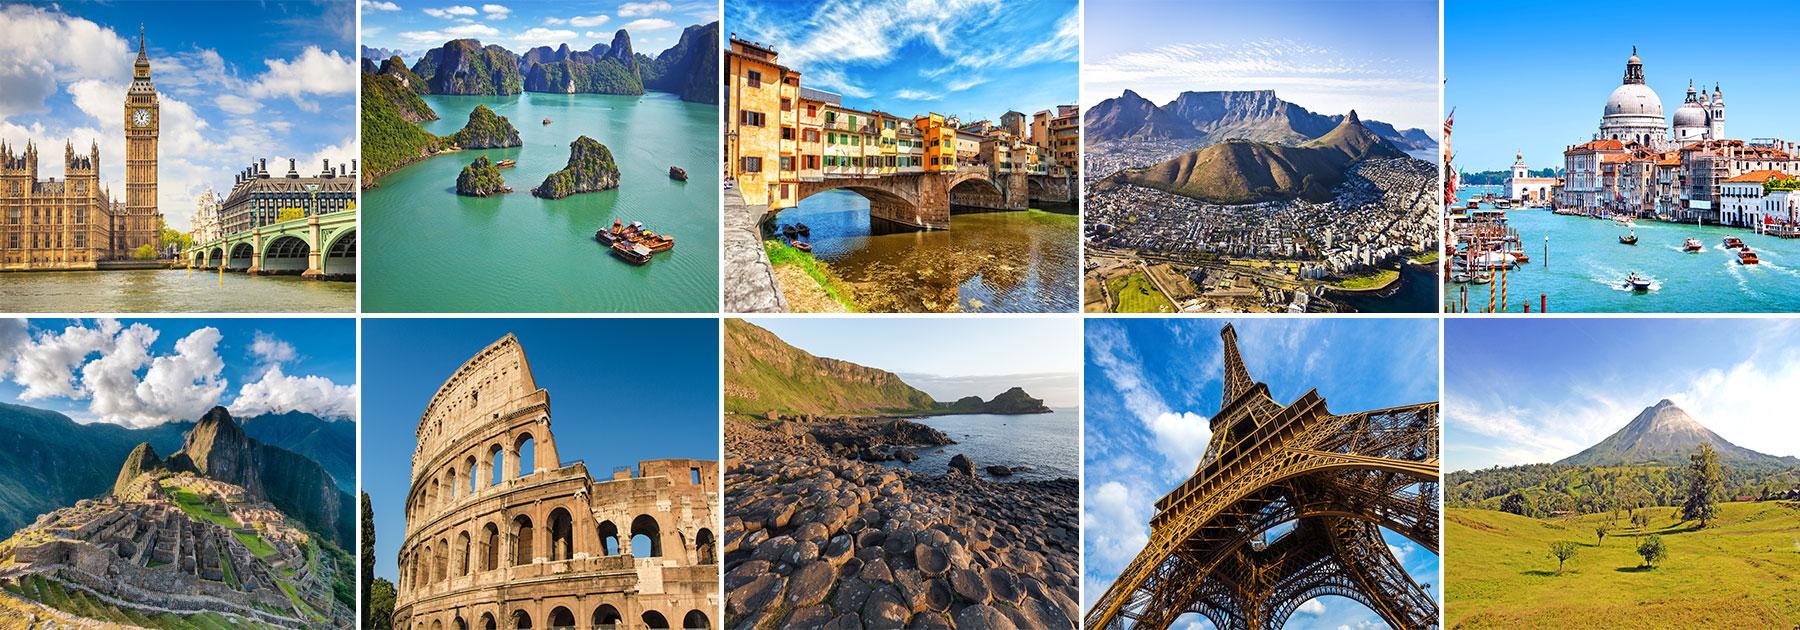 Go Today Tours Italy